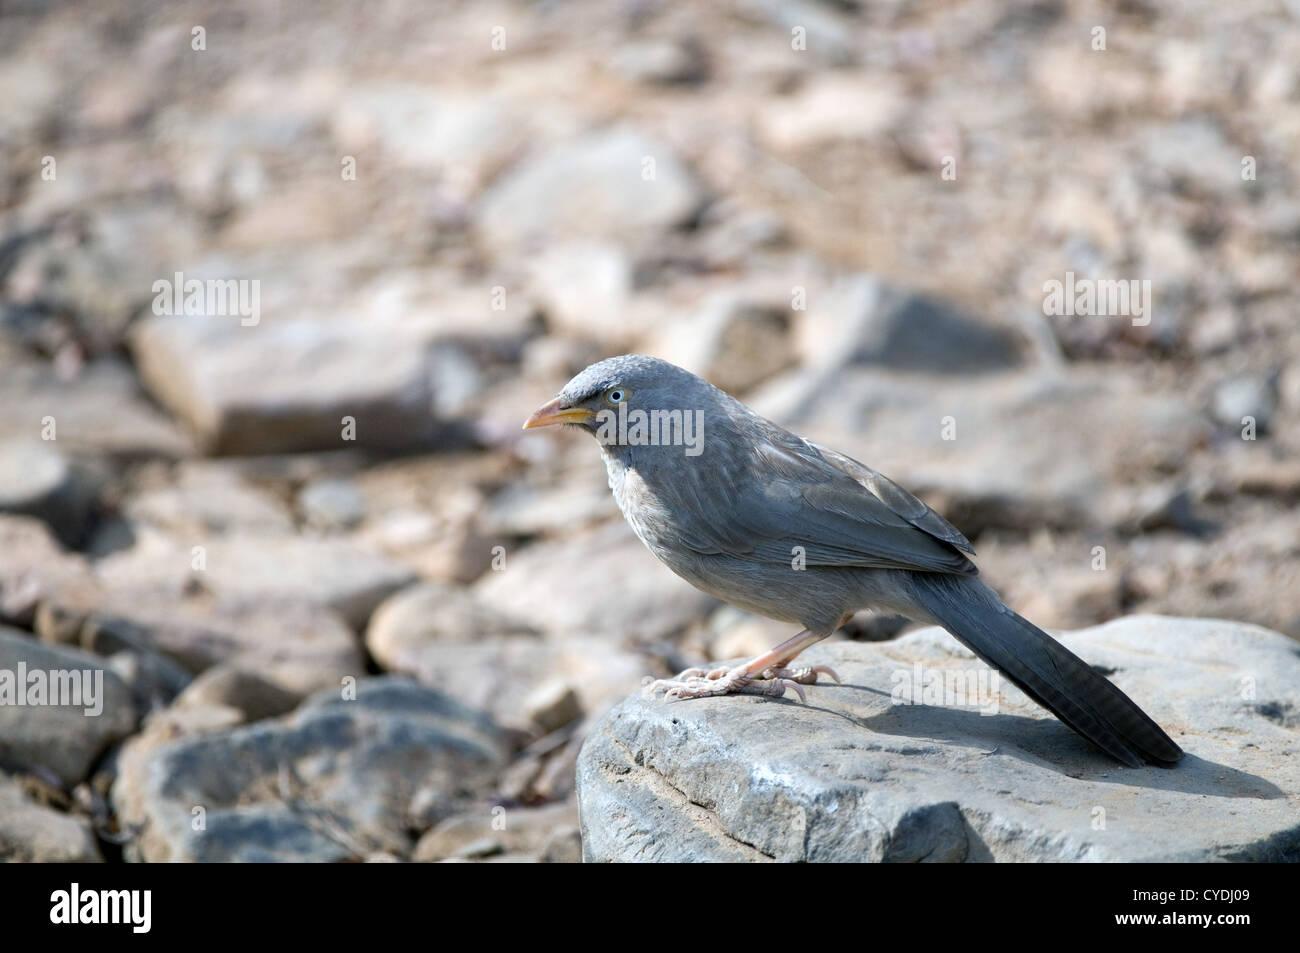 Jungle Babbler on ground - Stock Image